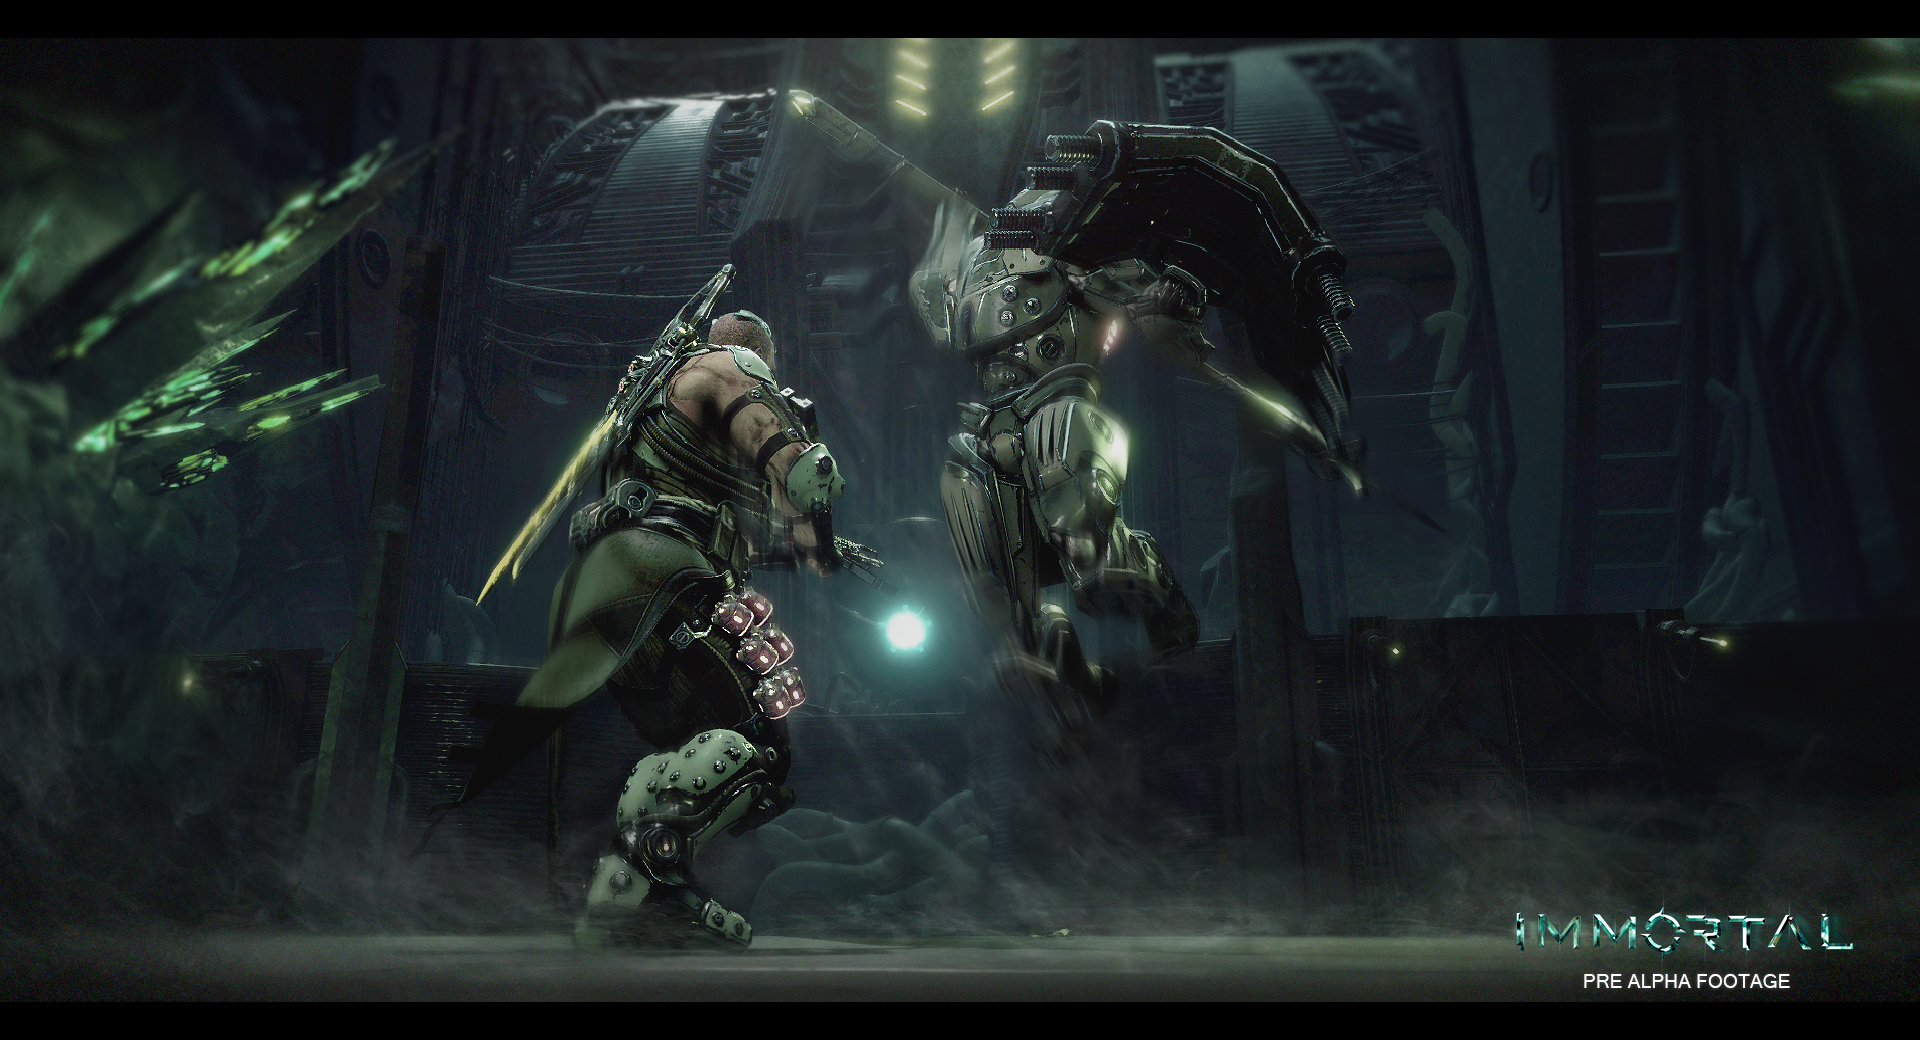 Immortal: Unchained is a Souls-like sci-fi shooter screenshot